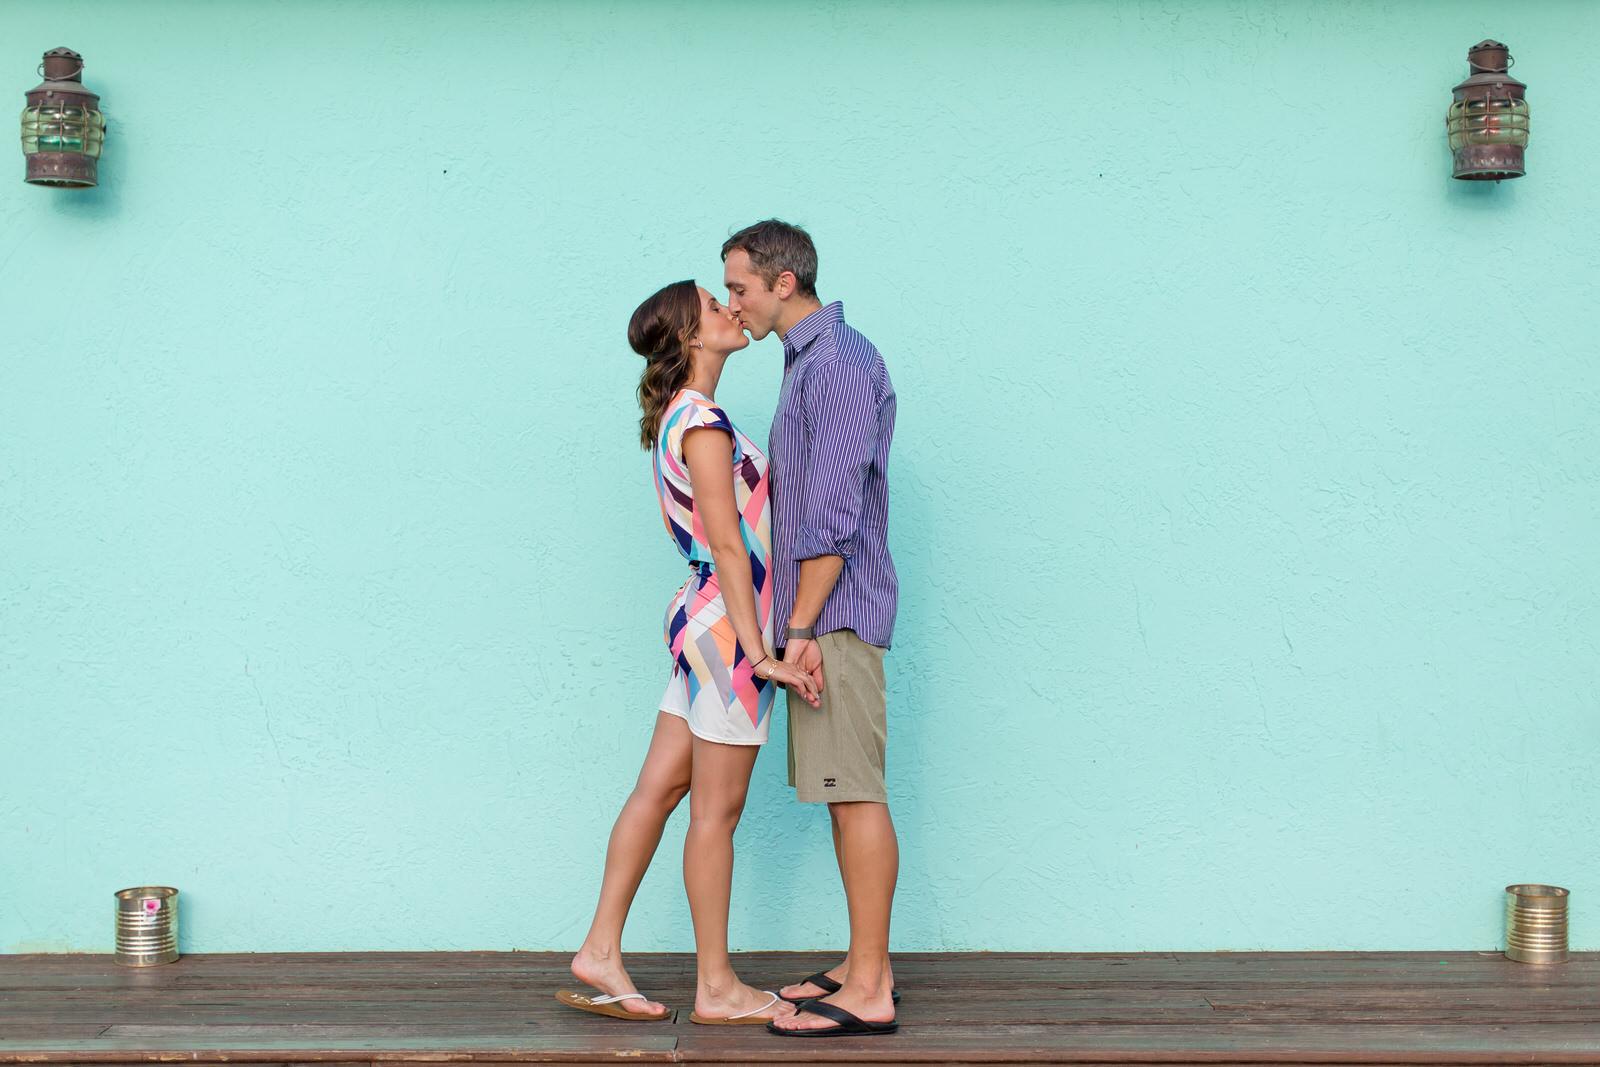 cute-engagement-portraits-tiny-house-photo-south-florida.jpg